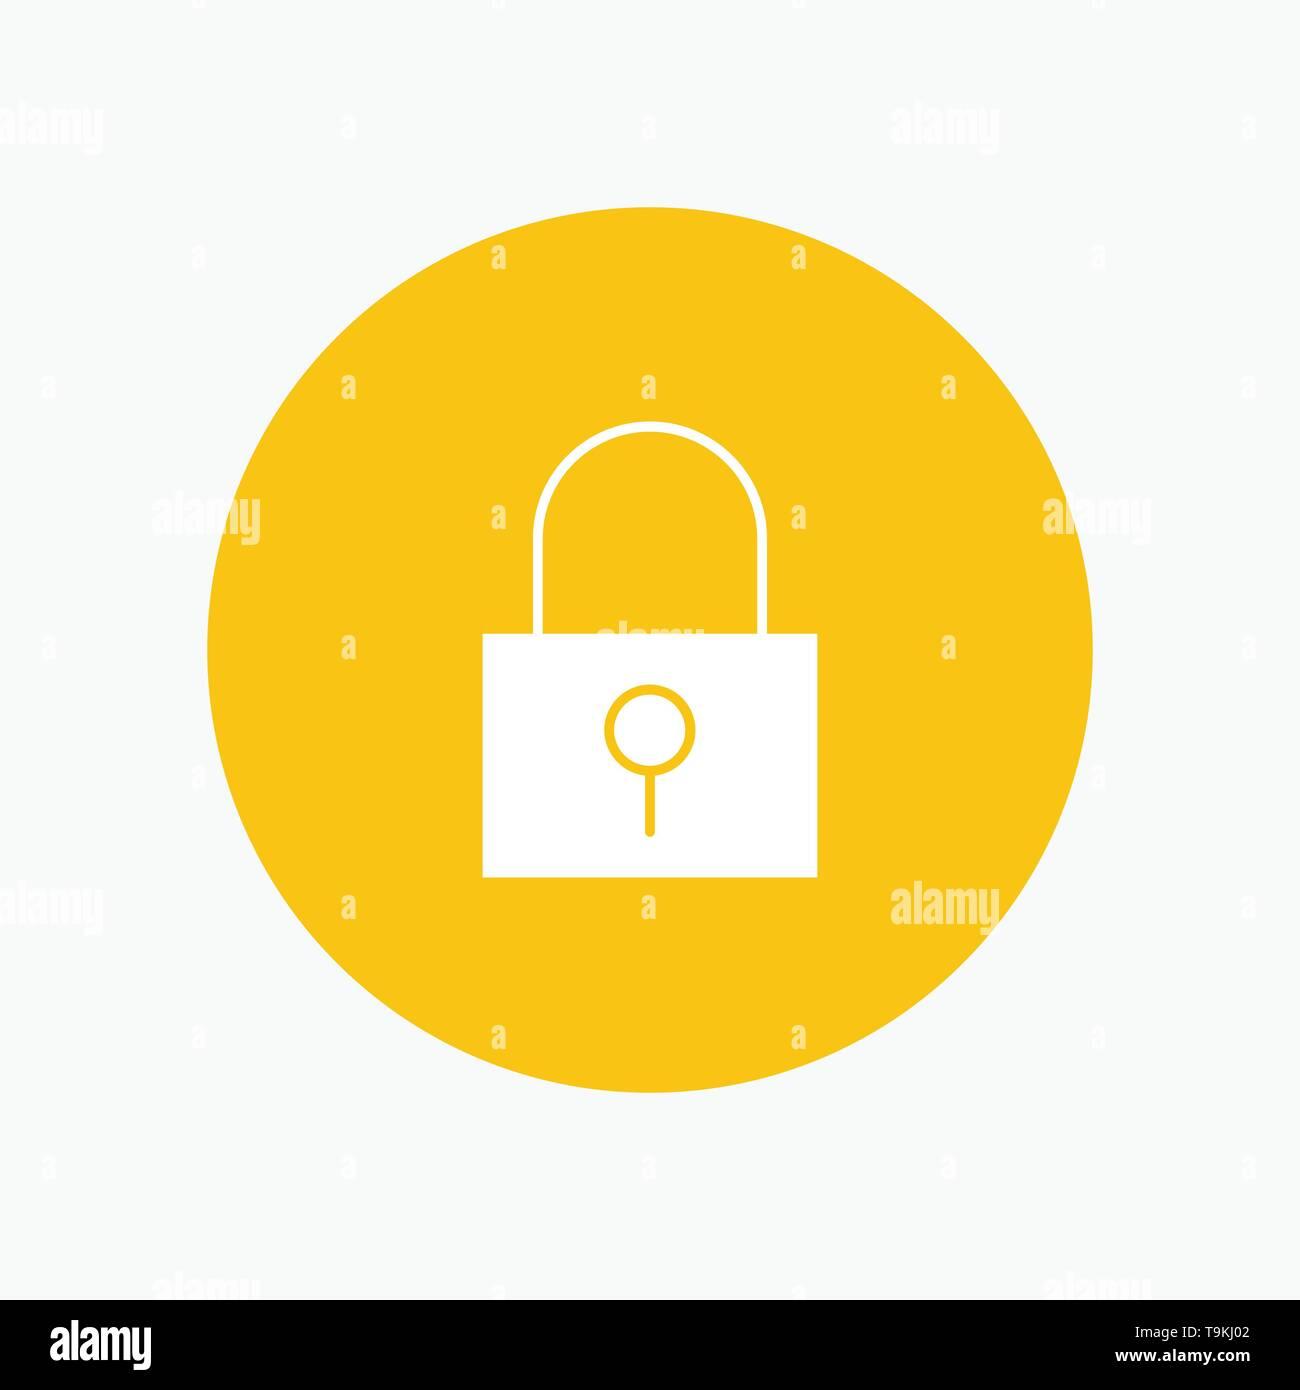 Lock, Password, Password Lock, Secure Password - Stock Image